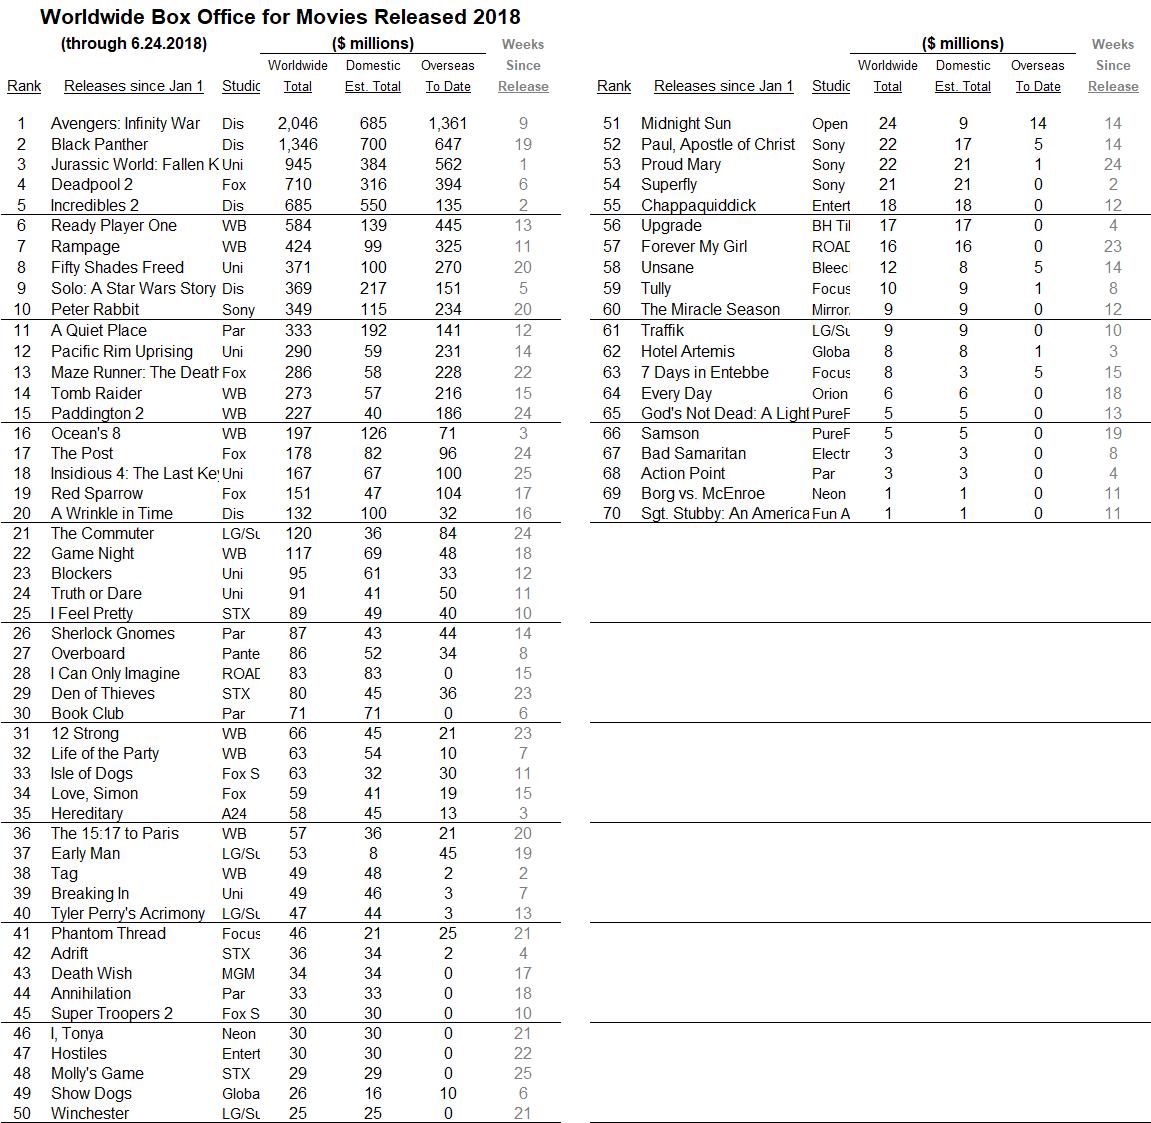 International 2018 through 2018 Jun 24